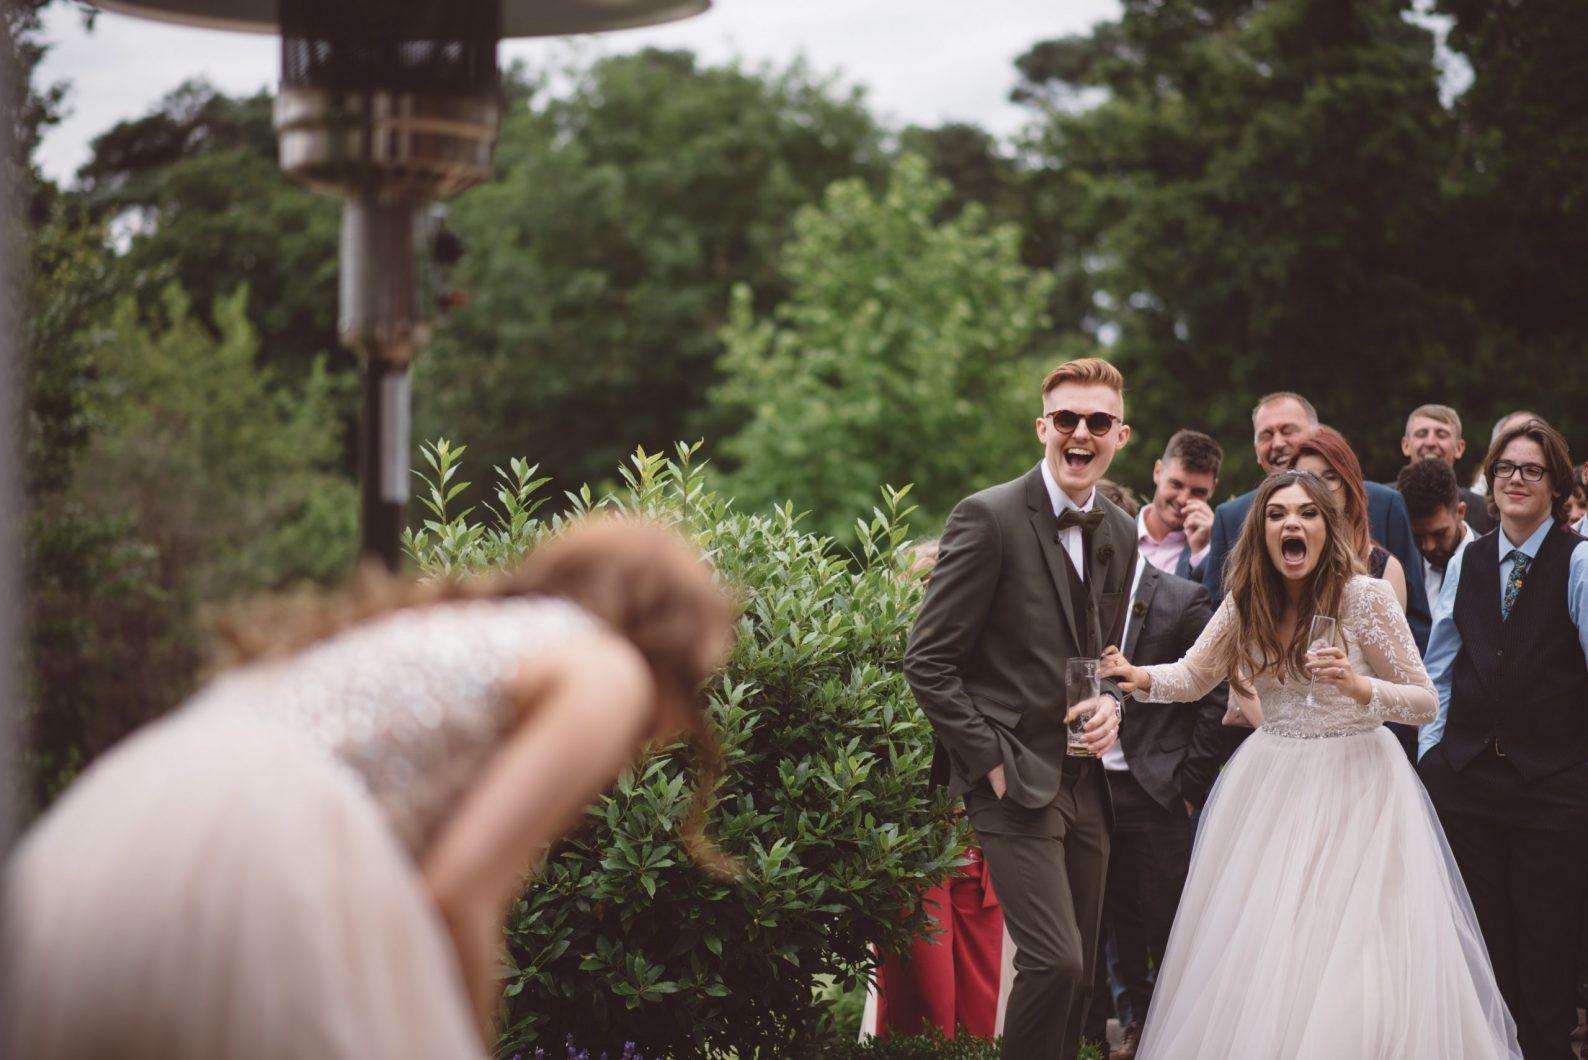 The warren estate wedding